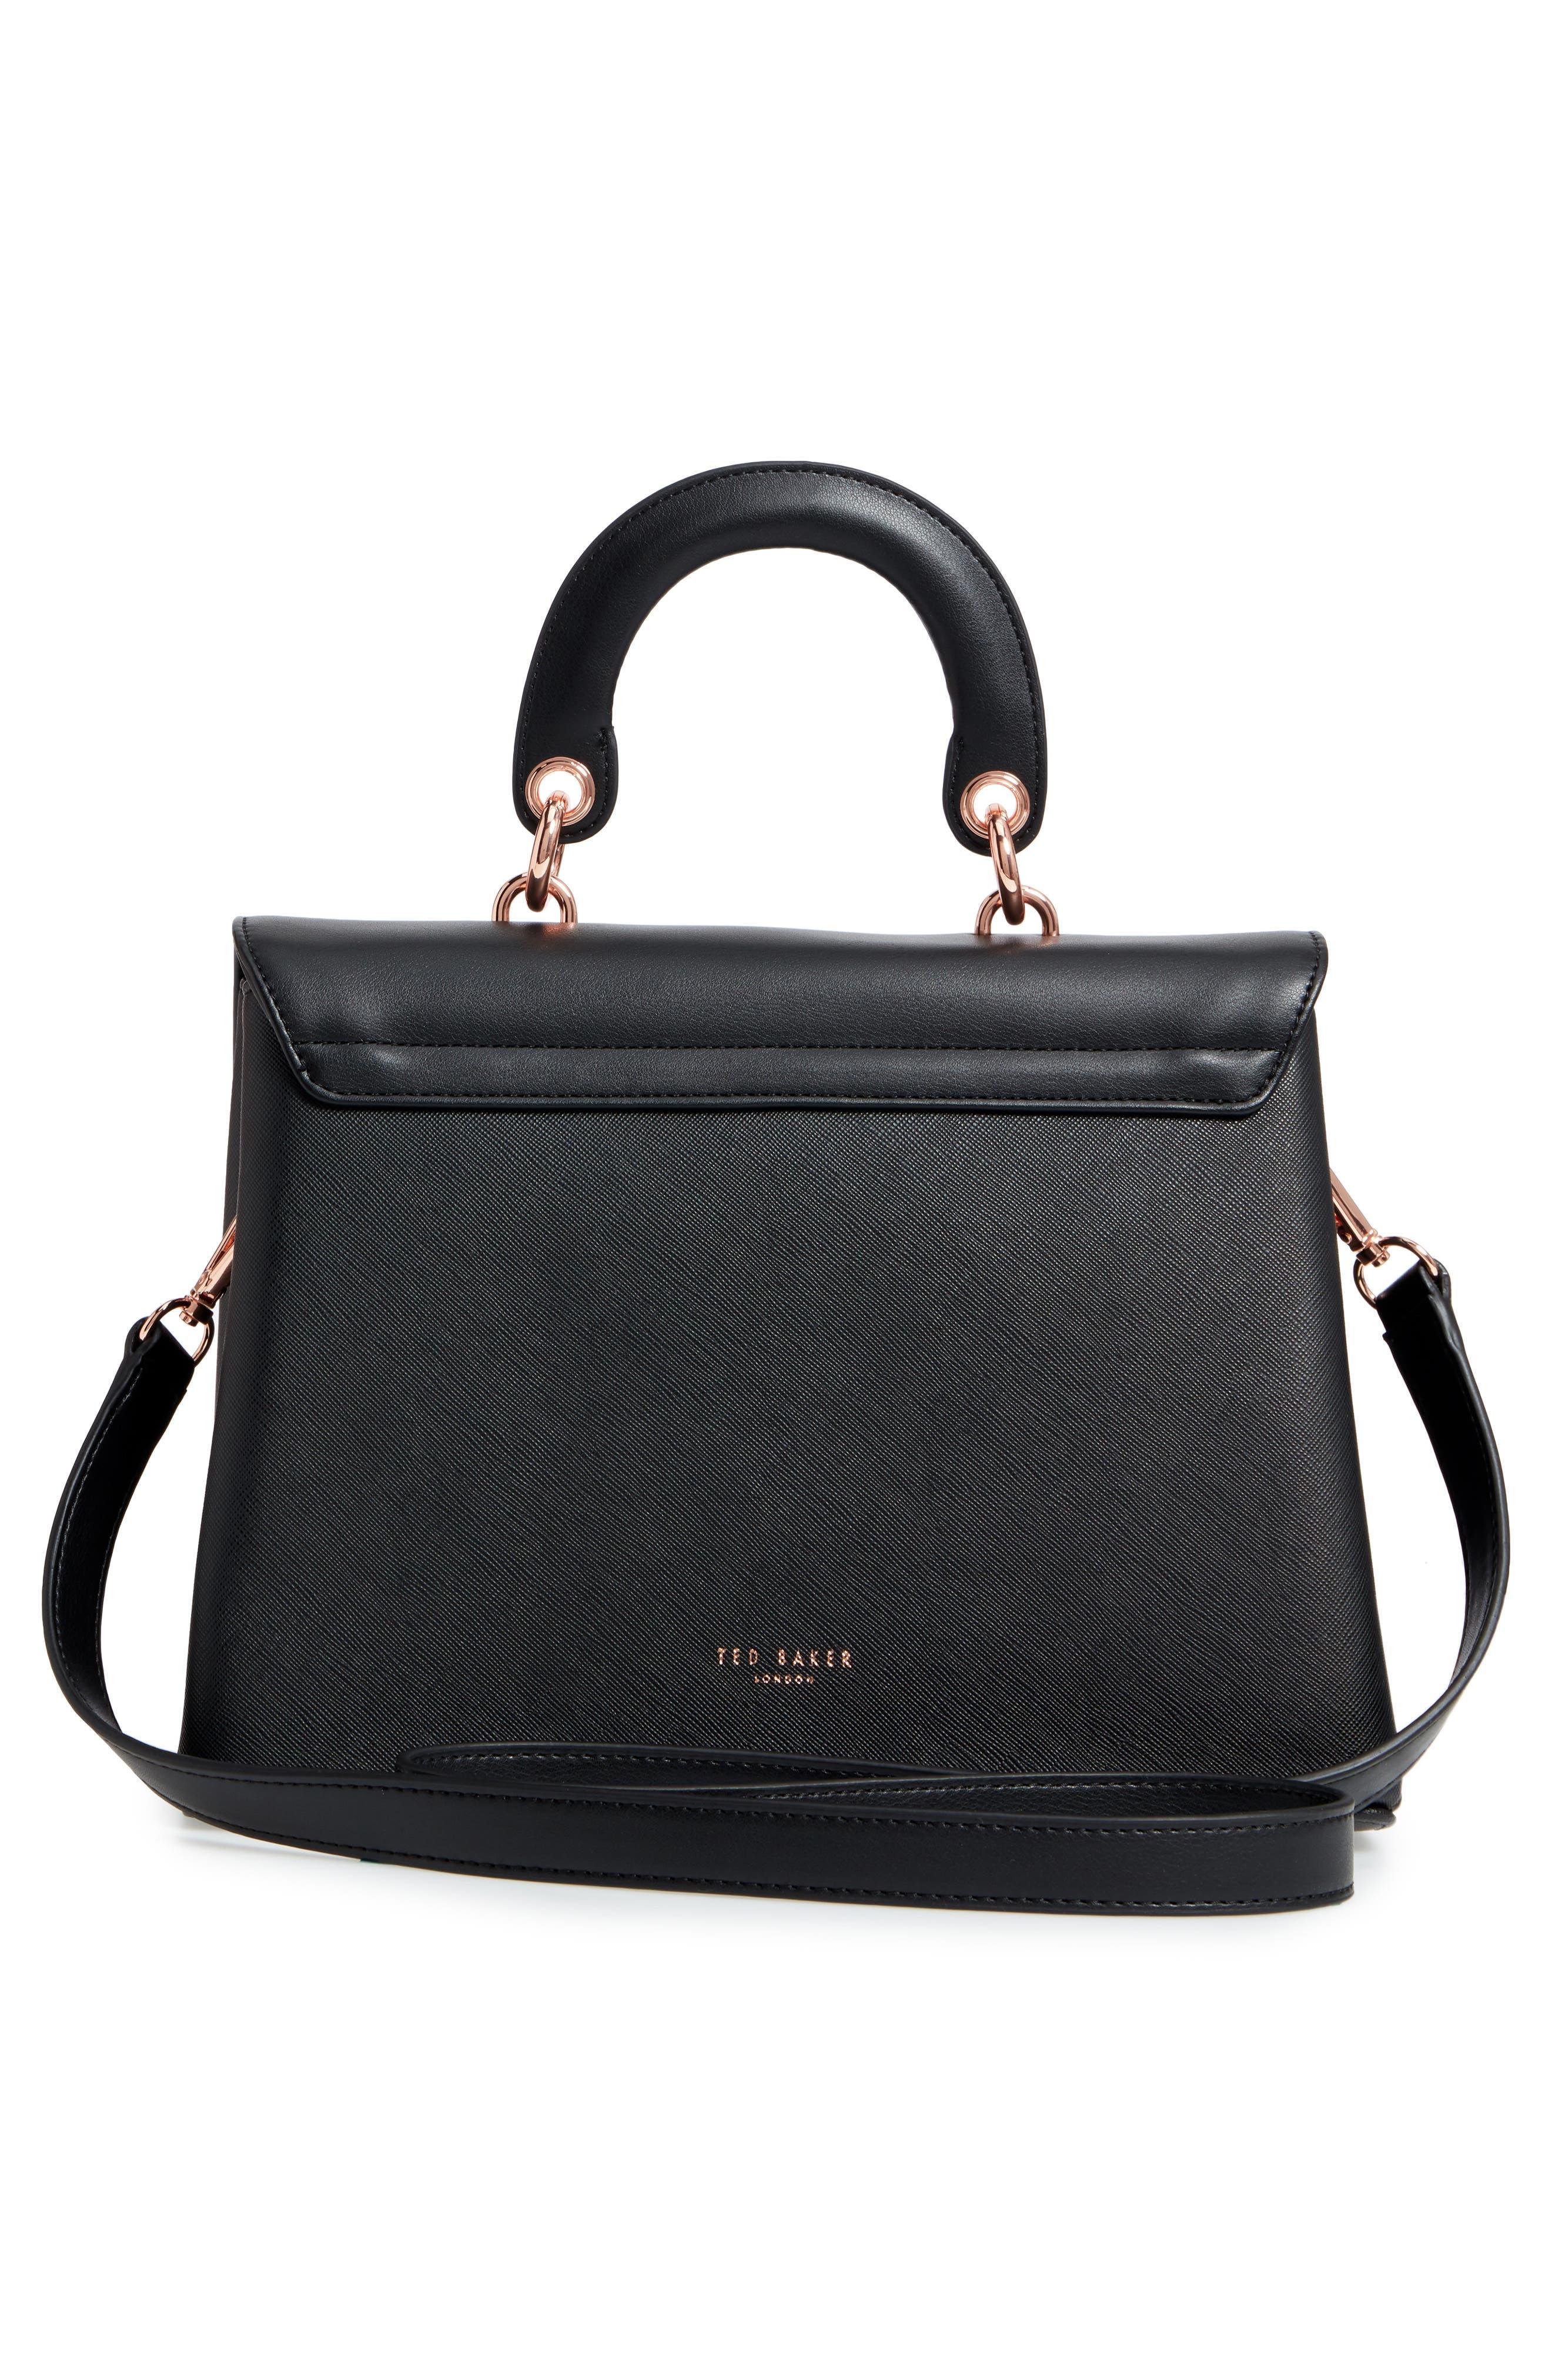 Keiira Lady Bag Faux Leather Top Handle Satchel,                             Alternate thumbnail 3, color,                             001